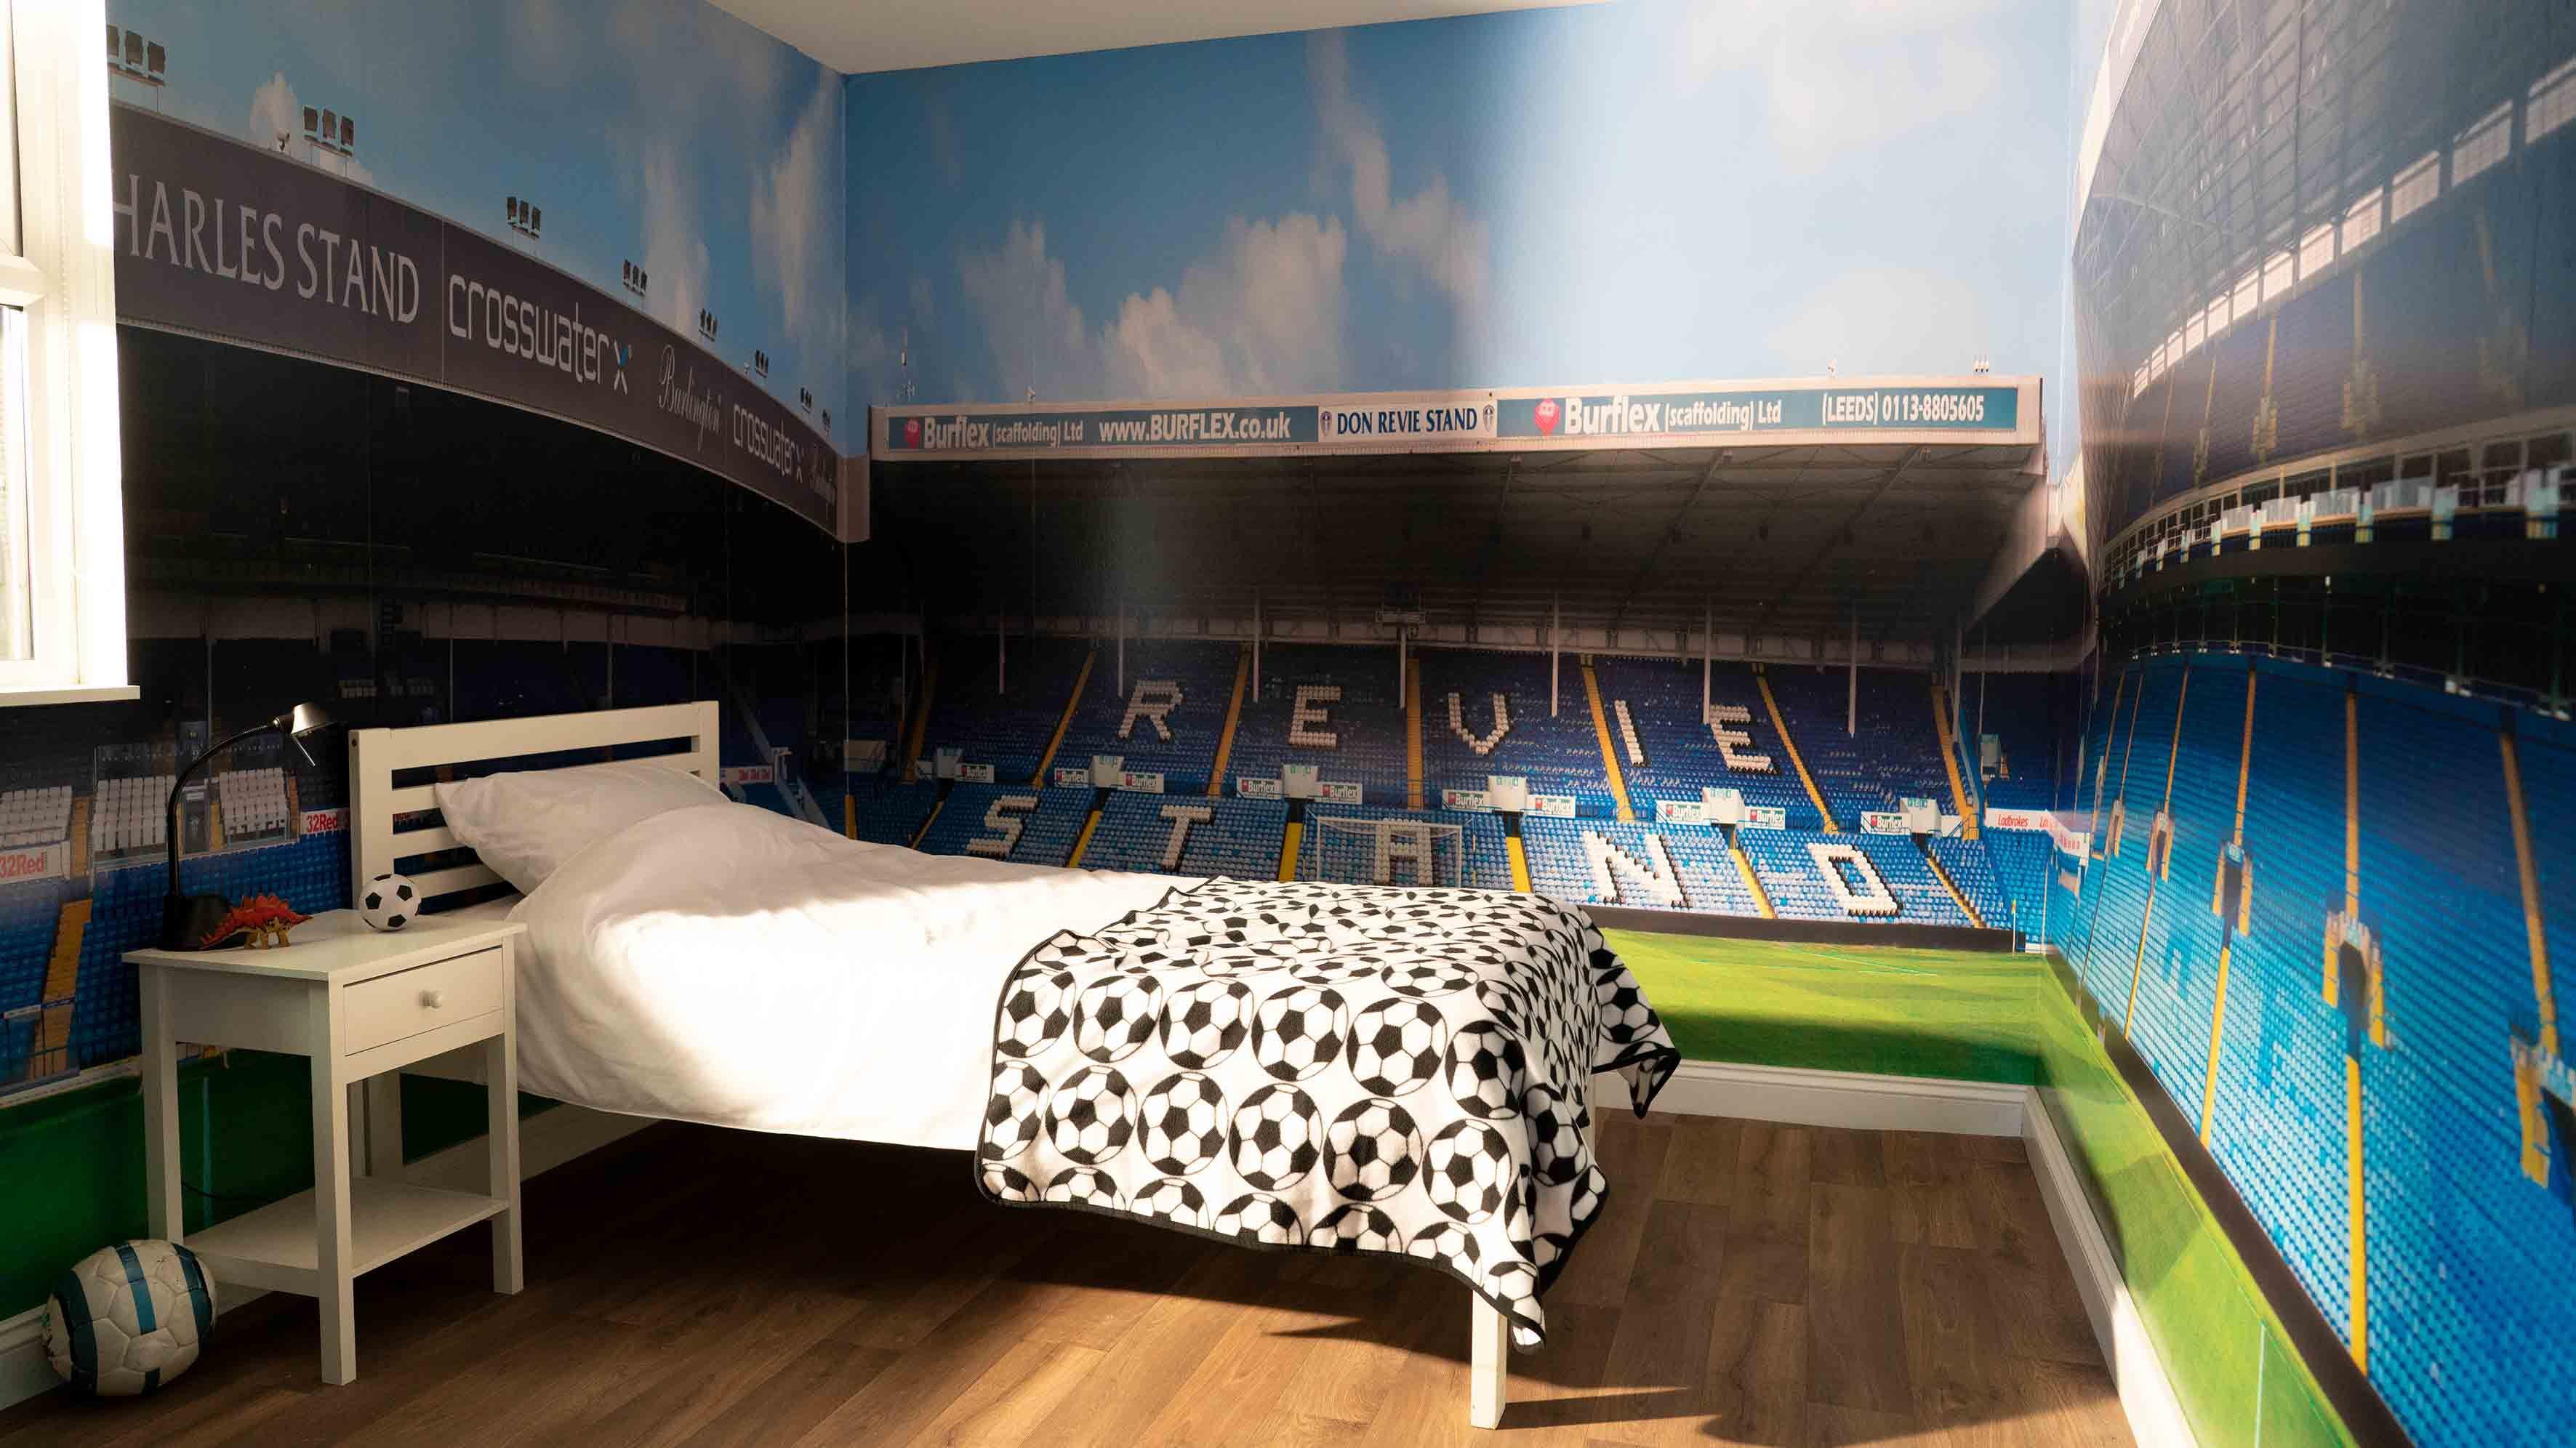 Football Stadium Boys Bedroom Wallpaper Mural Design Wm414: Pin By Arenaroom On 360° Stadium Wallpaper For Bedrooms In